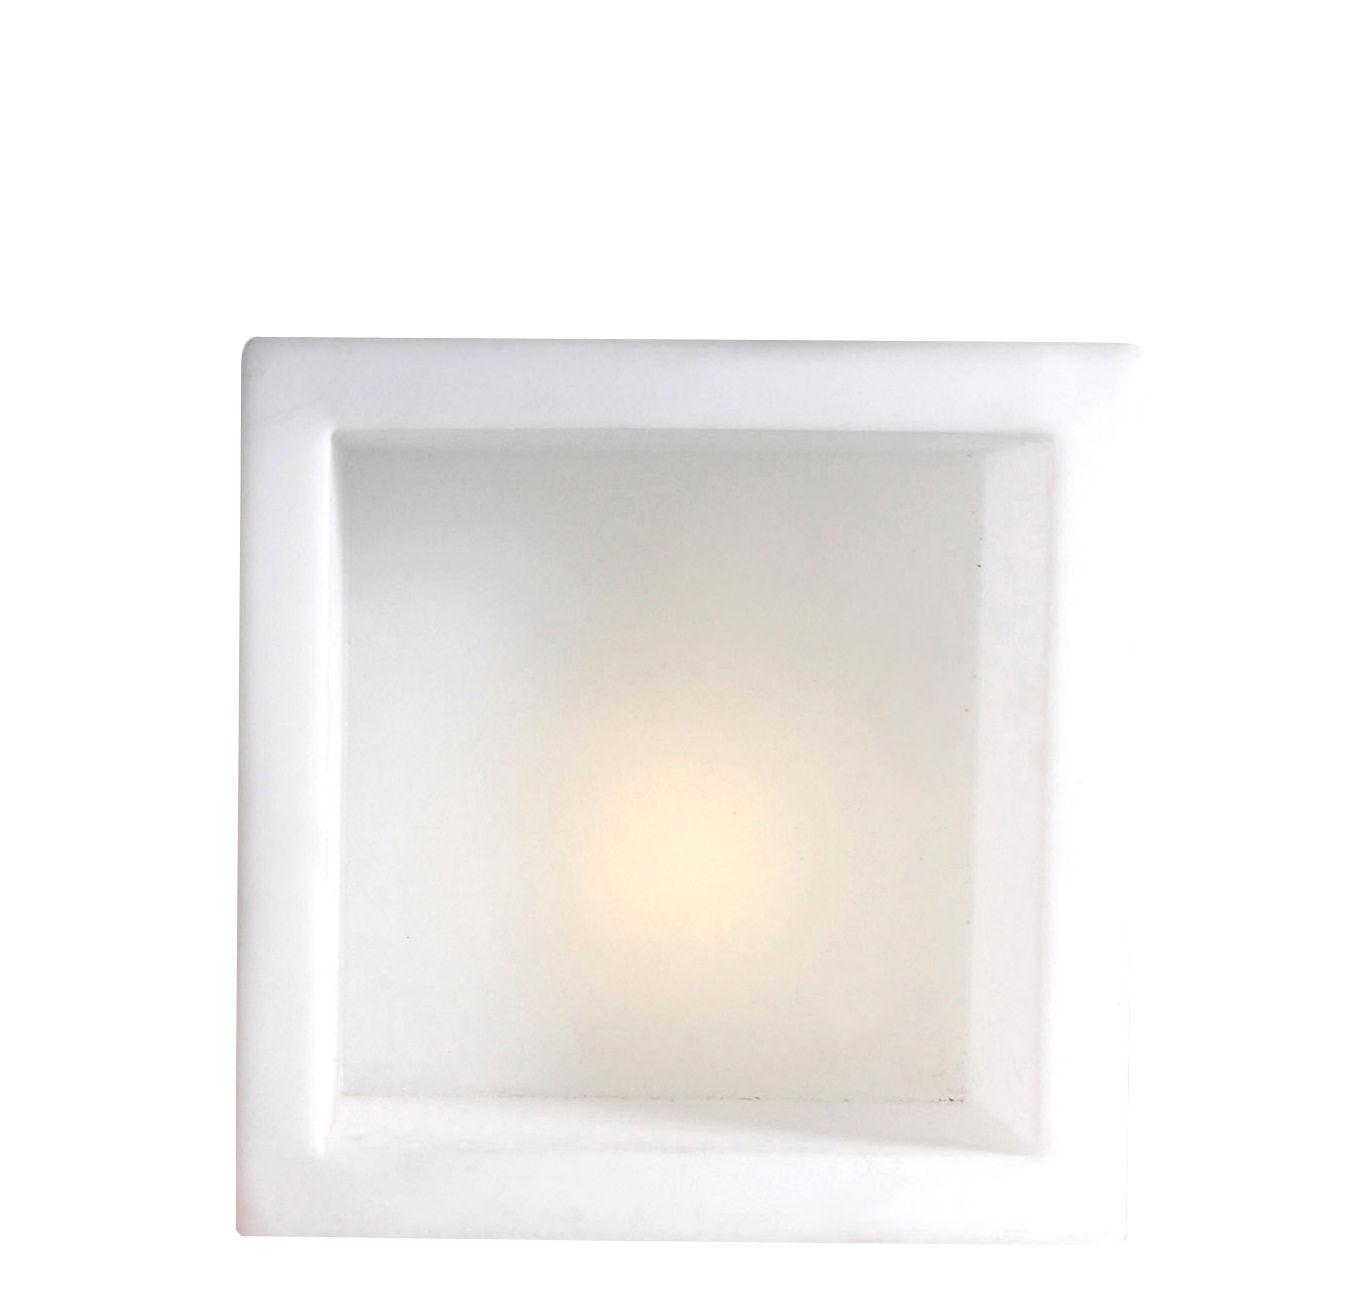 Furniture - Bookcases & Bookshelves - Open Cube Luminous shelf - Luminous by Slide - White - Polythene